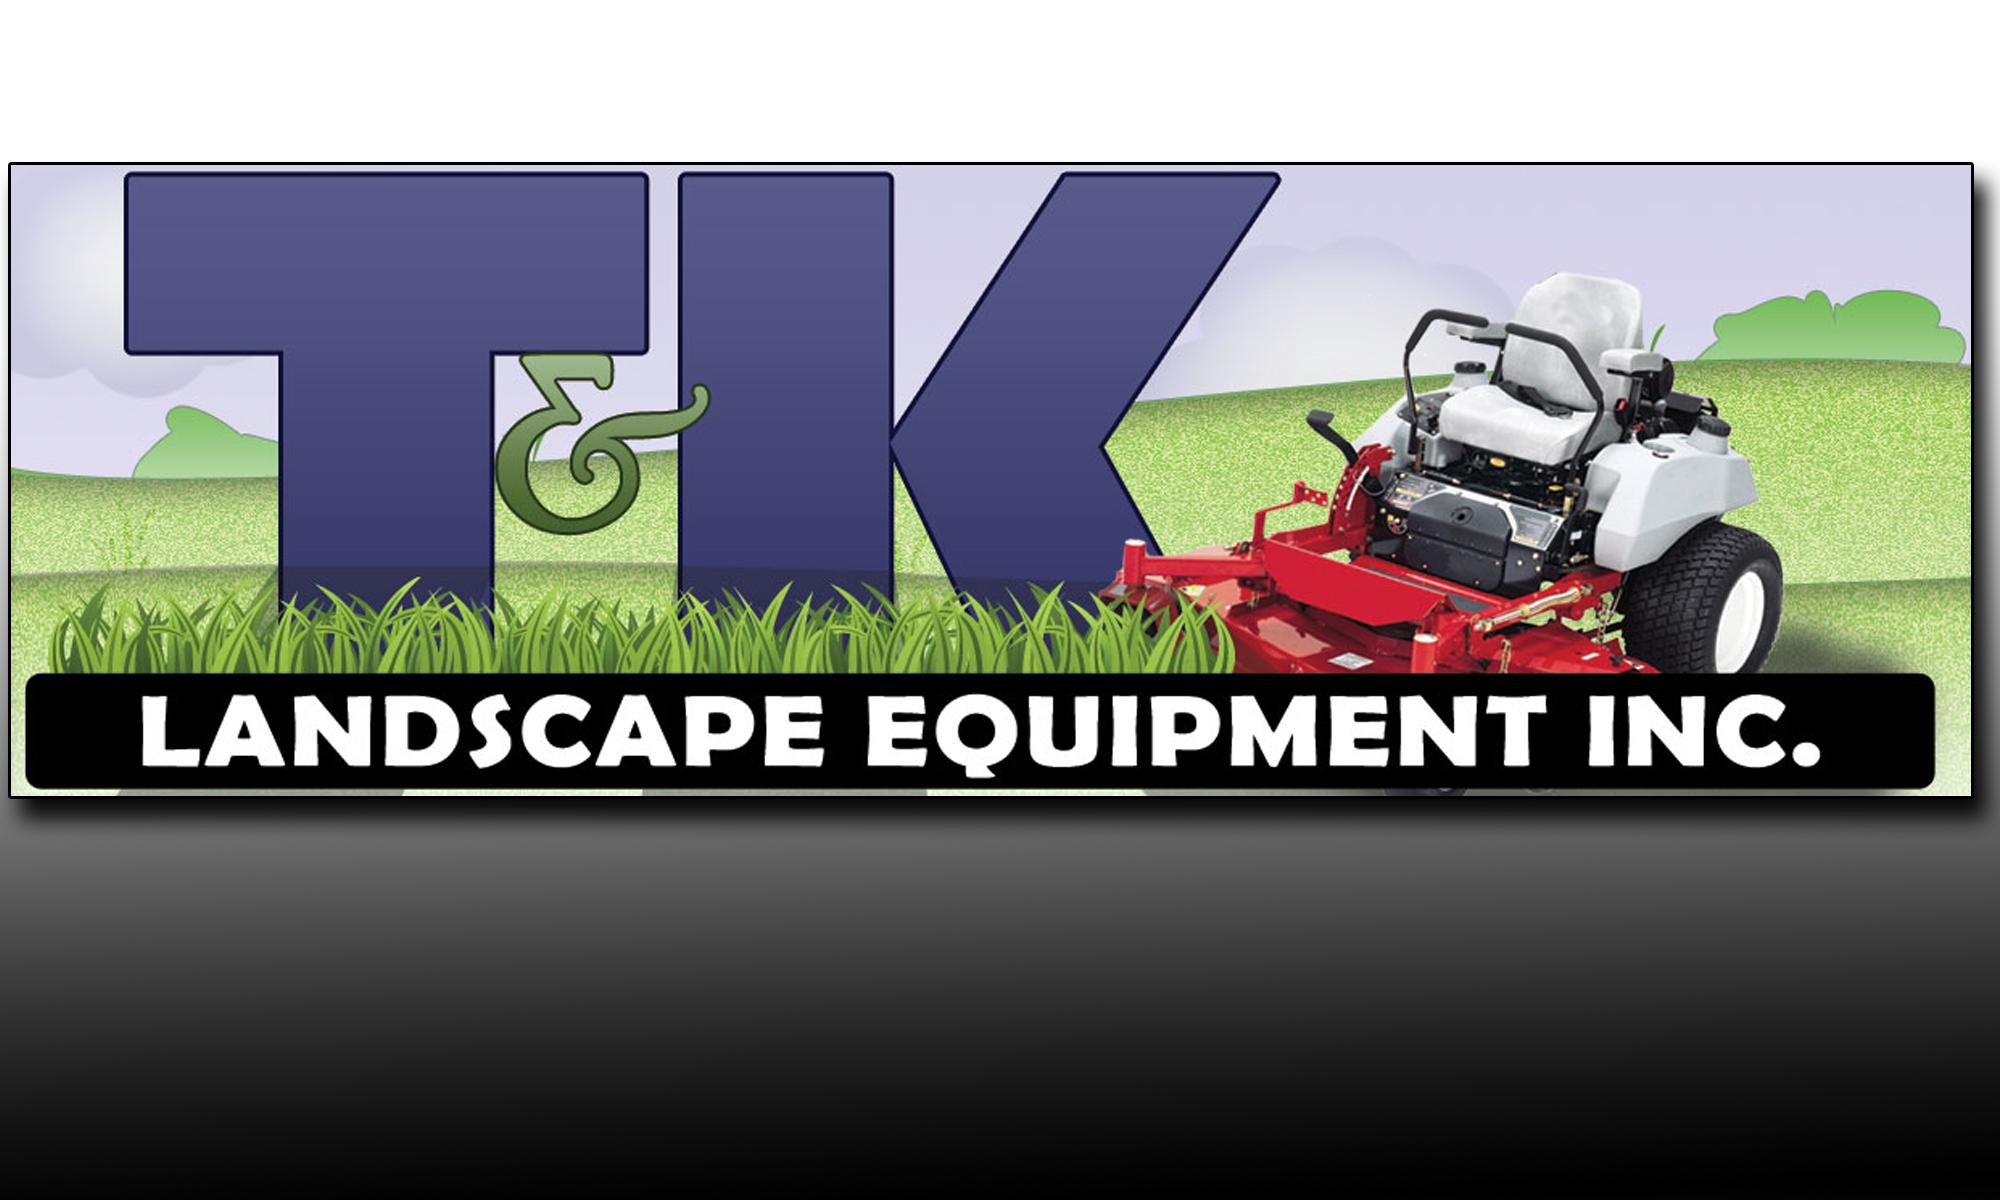 T & K Landscape Equipment